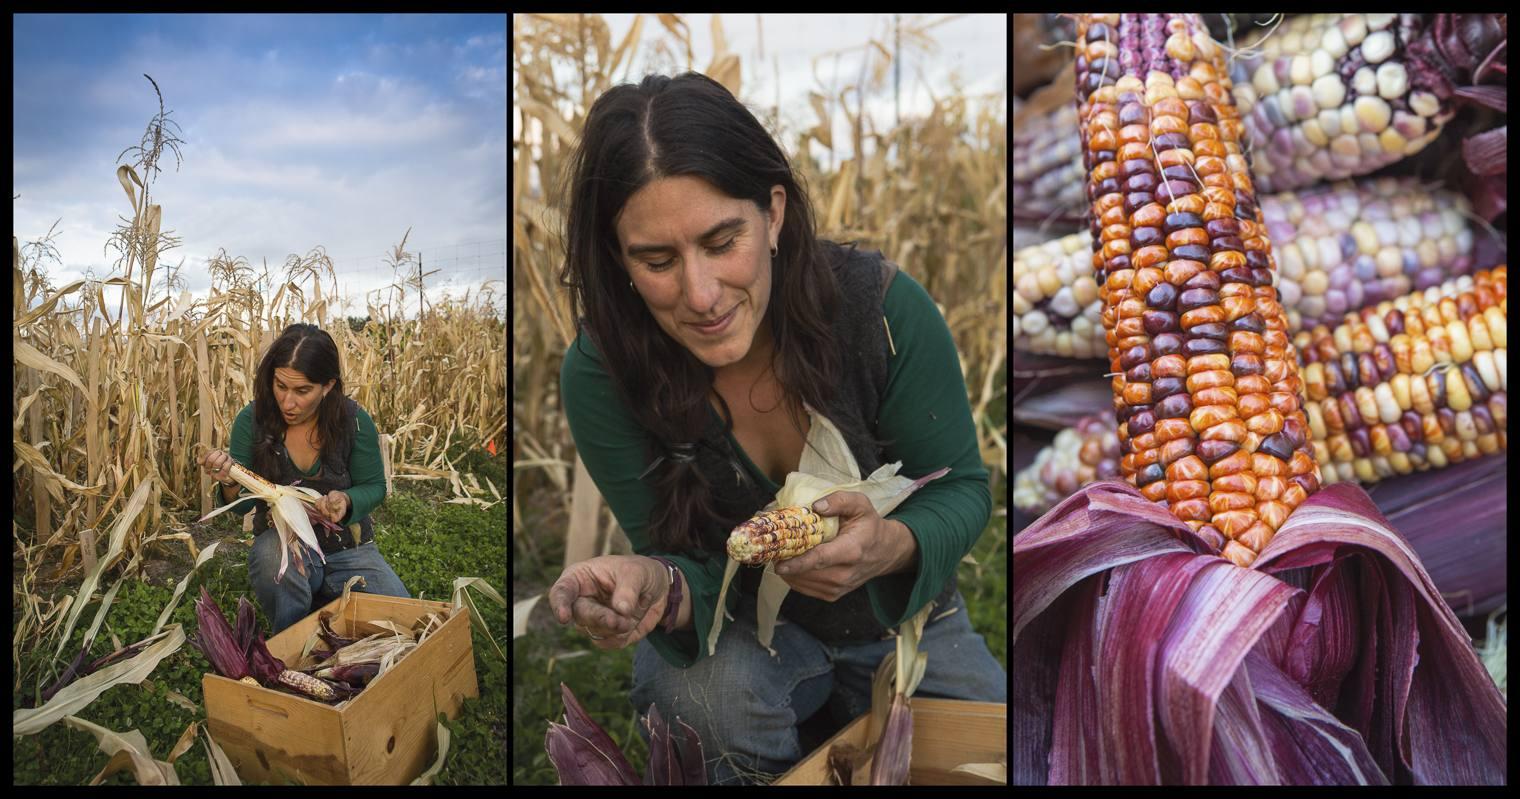 corn-harvest.jpg